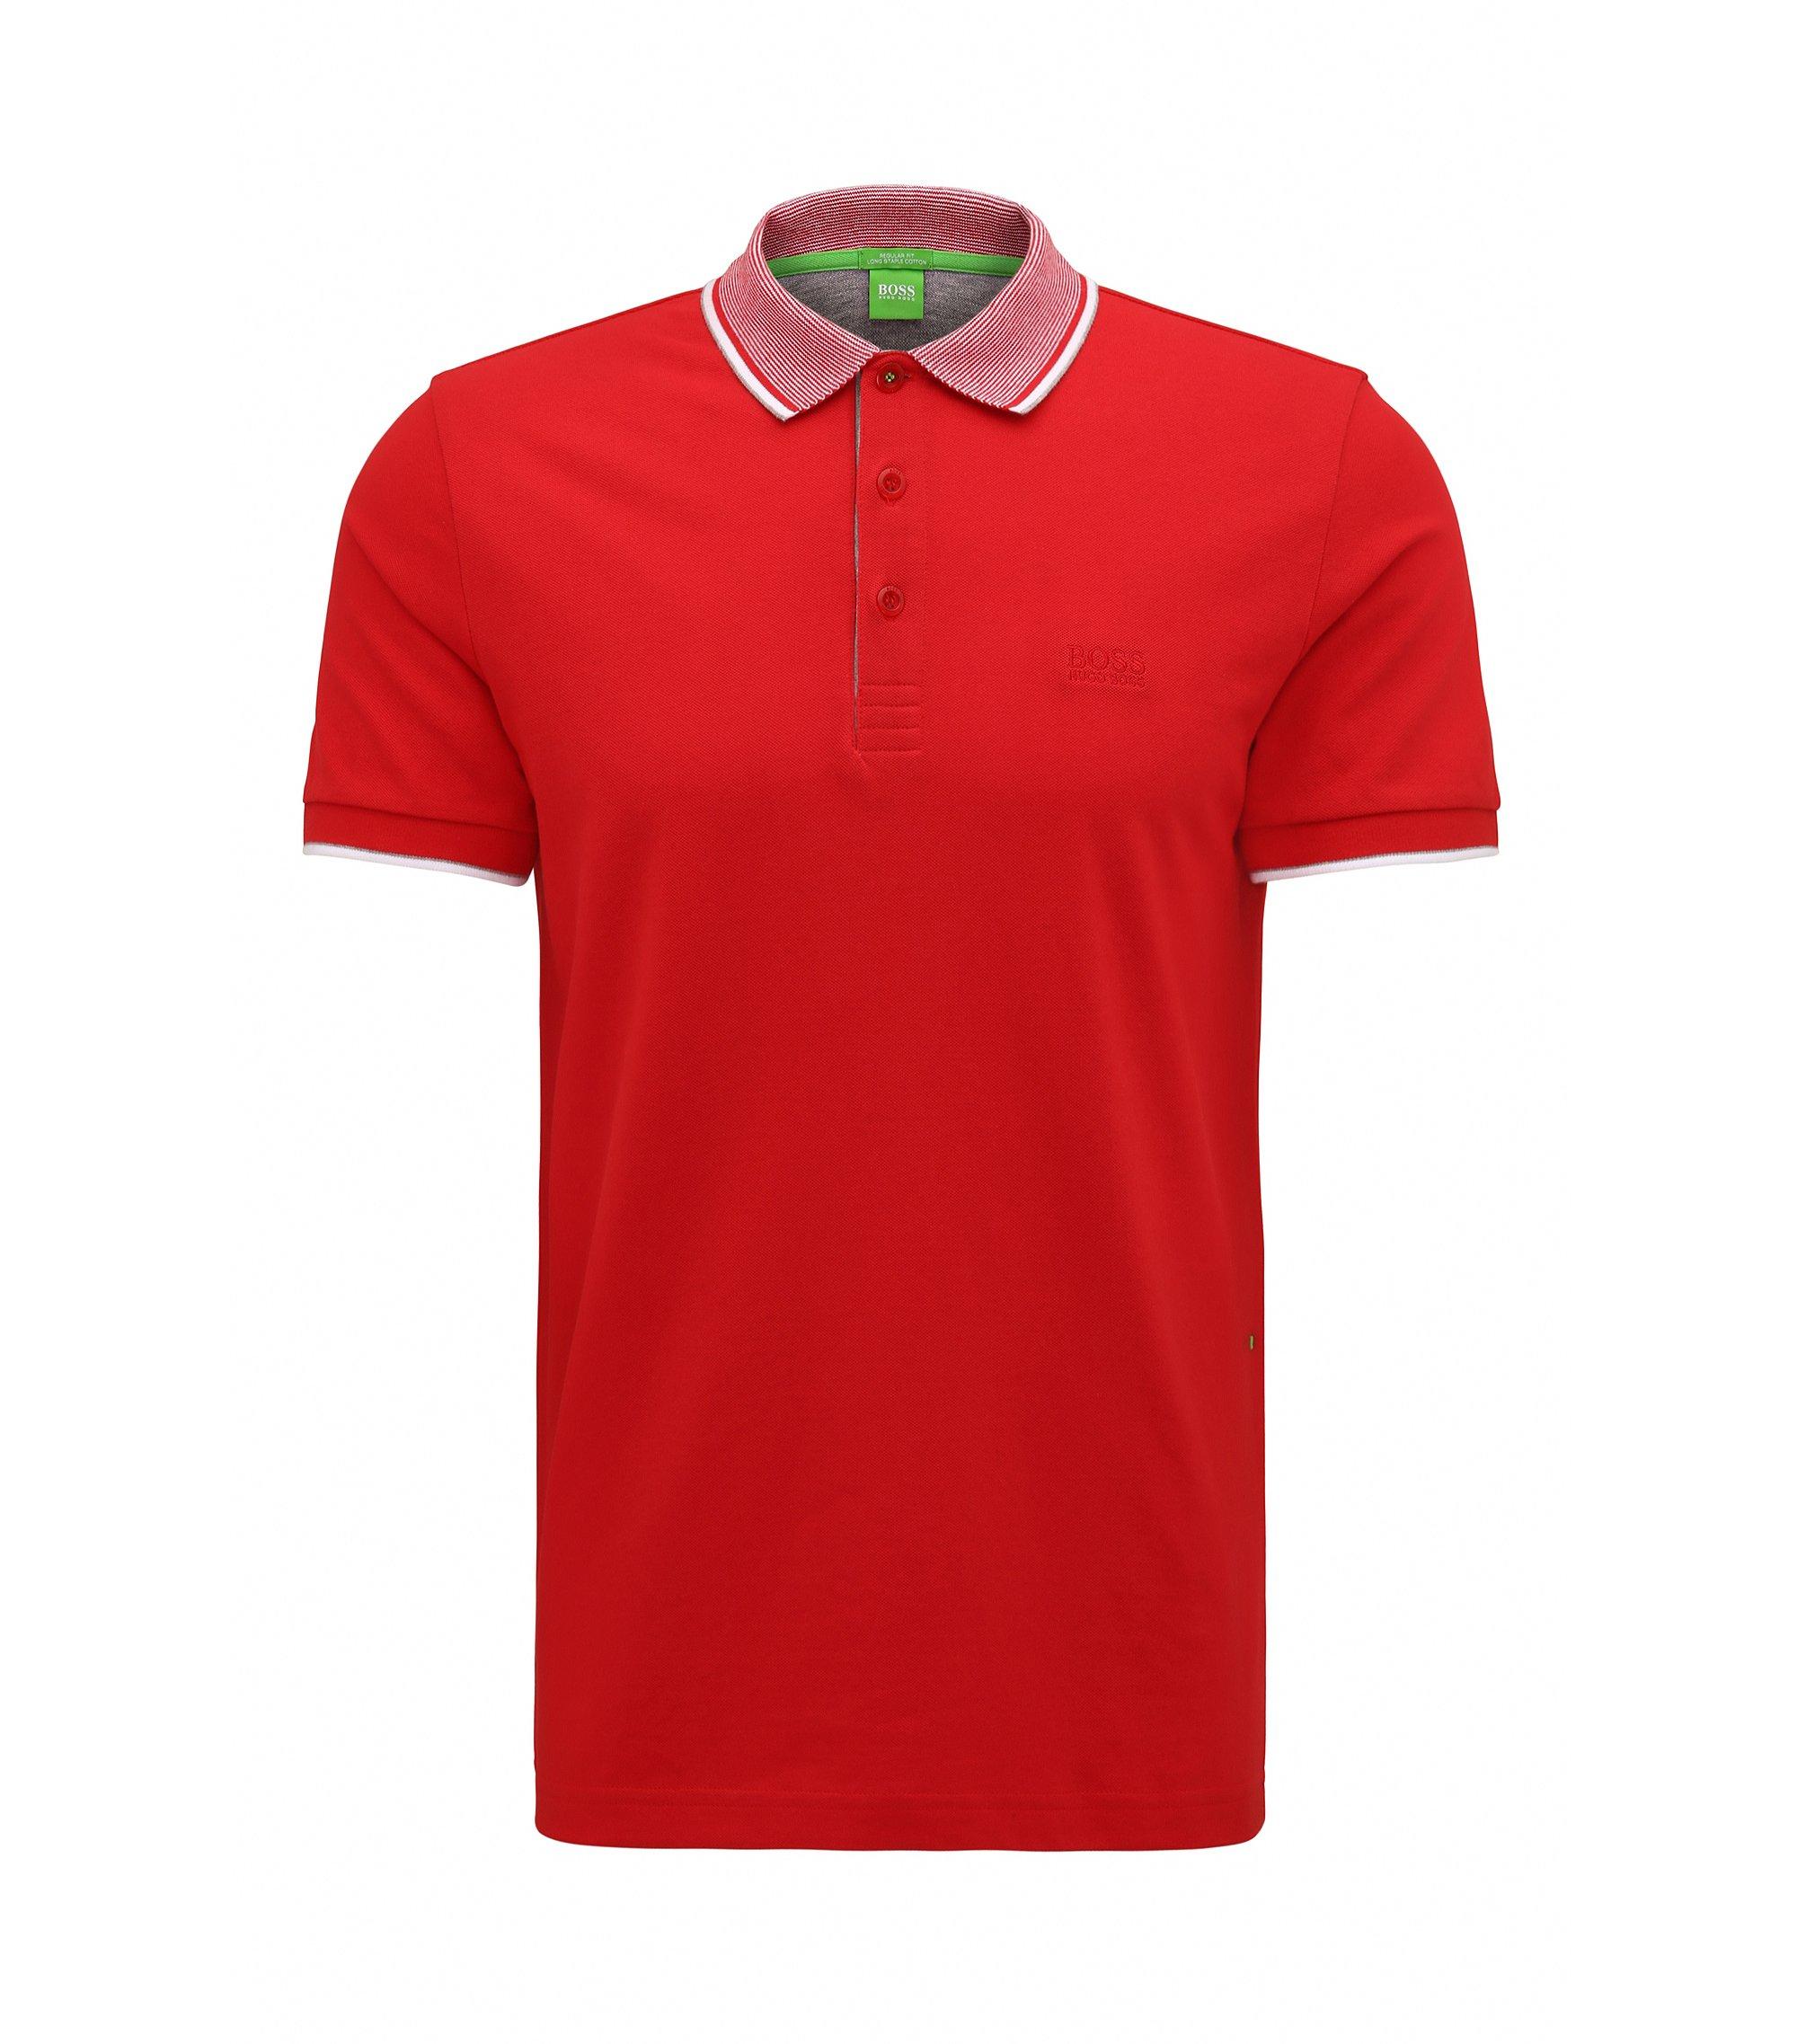 Cotton Piqué Polo Shirt, Regular Fit | Paddos, Red